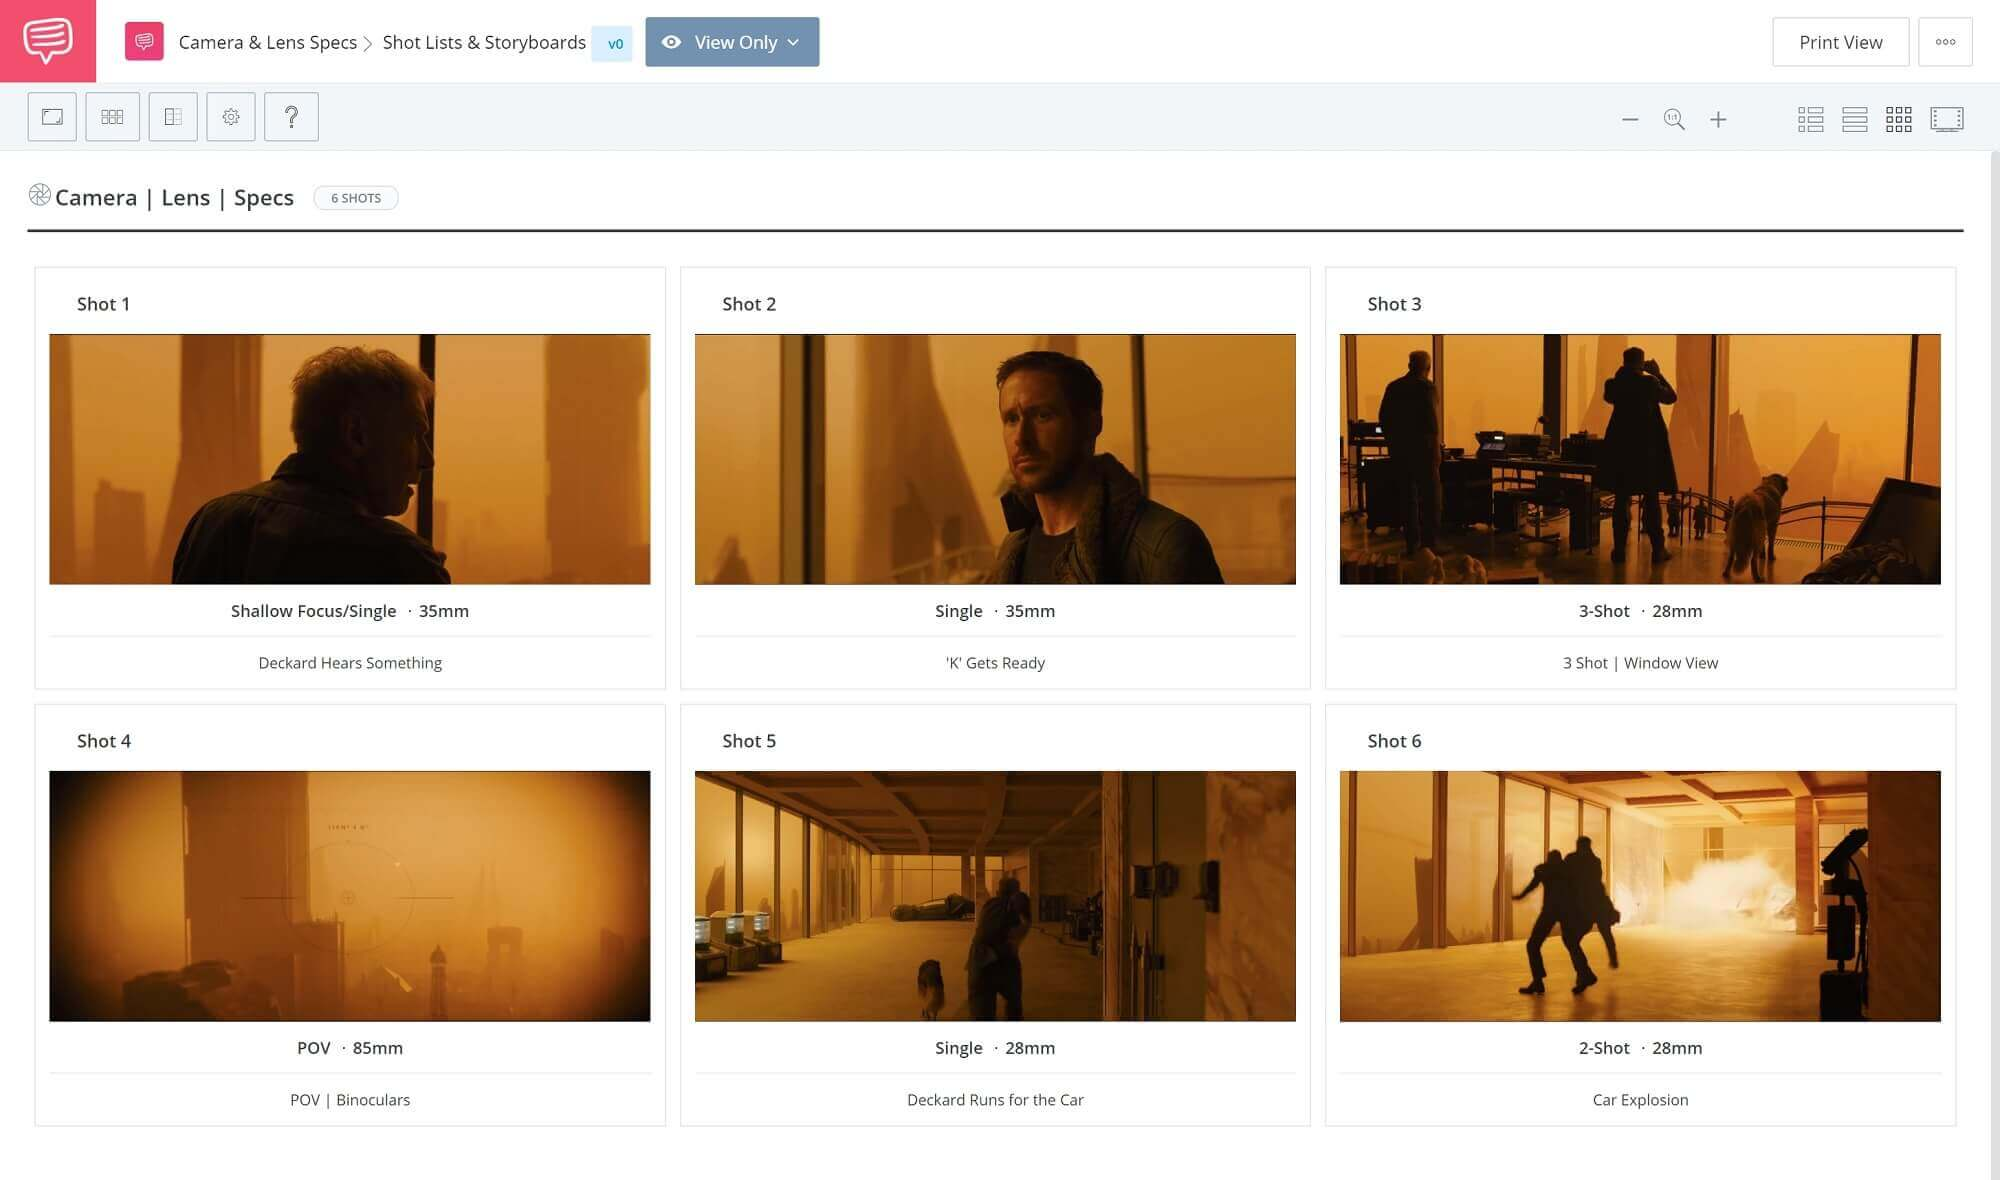 The Different Types of Camera Lenses - Blade Runner 2049 Shot-List - StudioBinder Shot-Listing Software